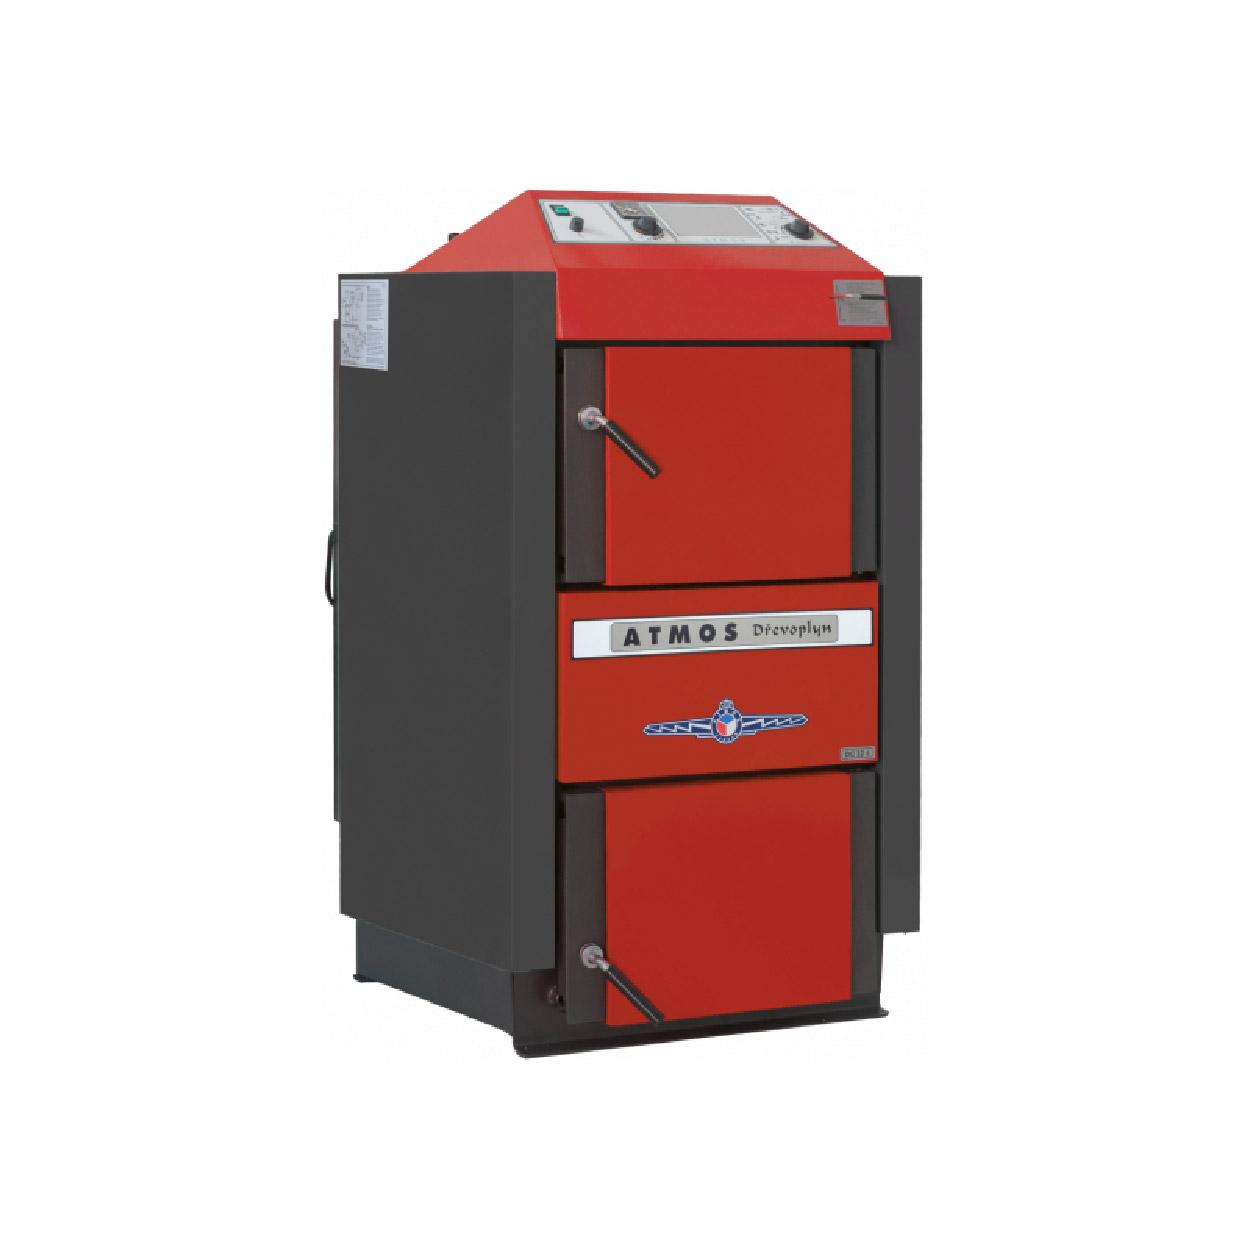 Centrala termica pe lemne ATMOS DC20GS 20 kW fornello imagine